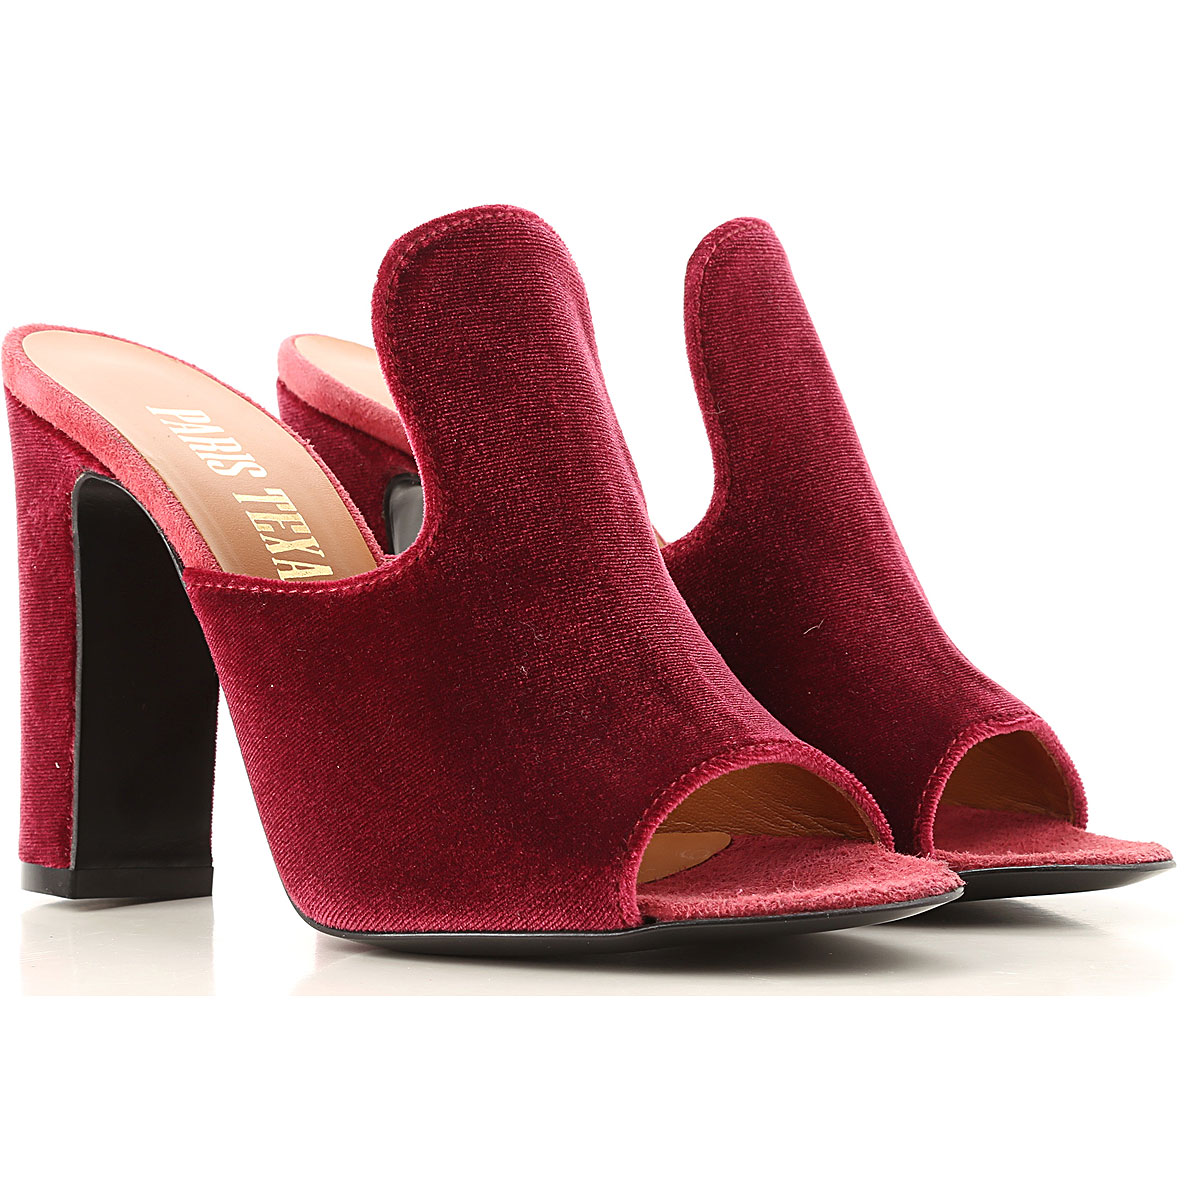 Paris Texas Peep Toe Open Shoes & Heels On Sale in Outlet, Cherry, Velvet, 2019, 10 6 8